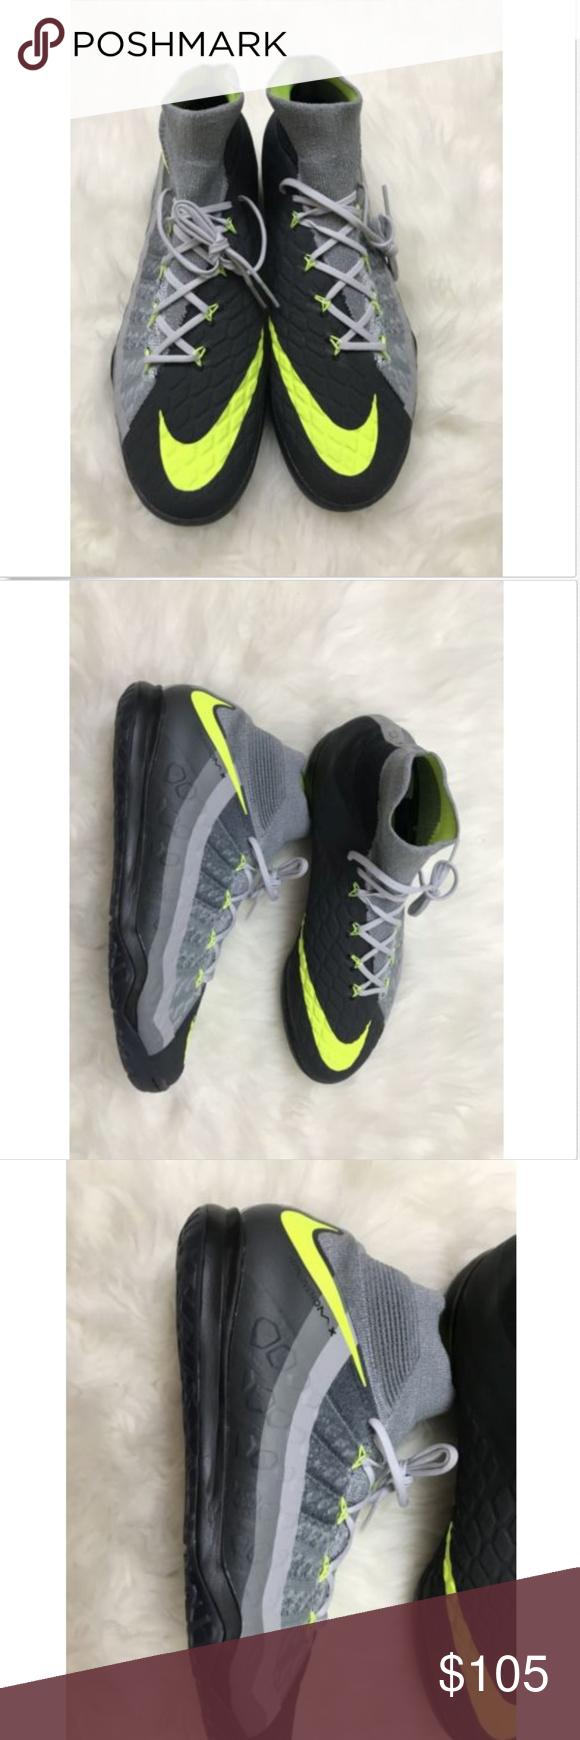 54e58e2fe30f Nike Hypervenomx Proximo II ACC IC Revolution Air Nike Hypervenomx Proximo  II ACC IC Revolution Air